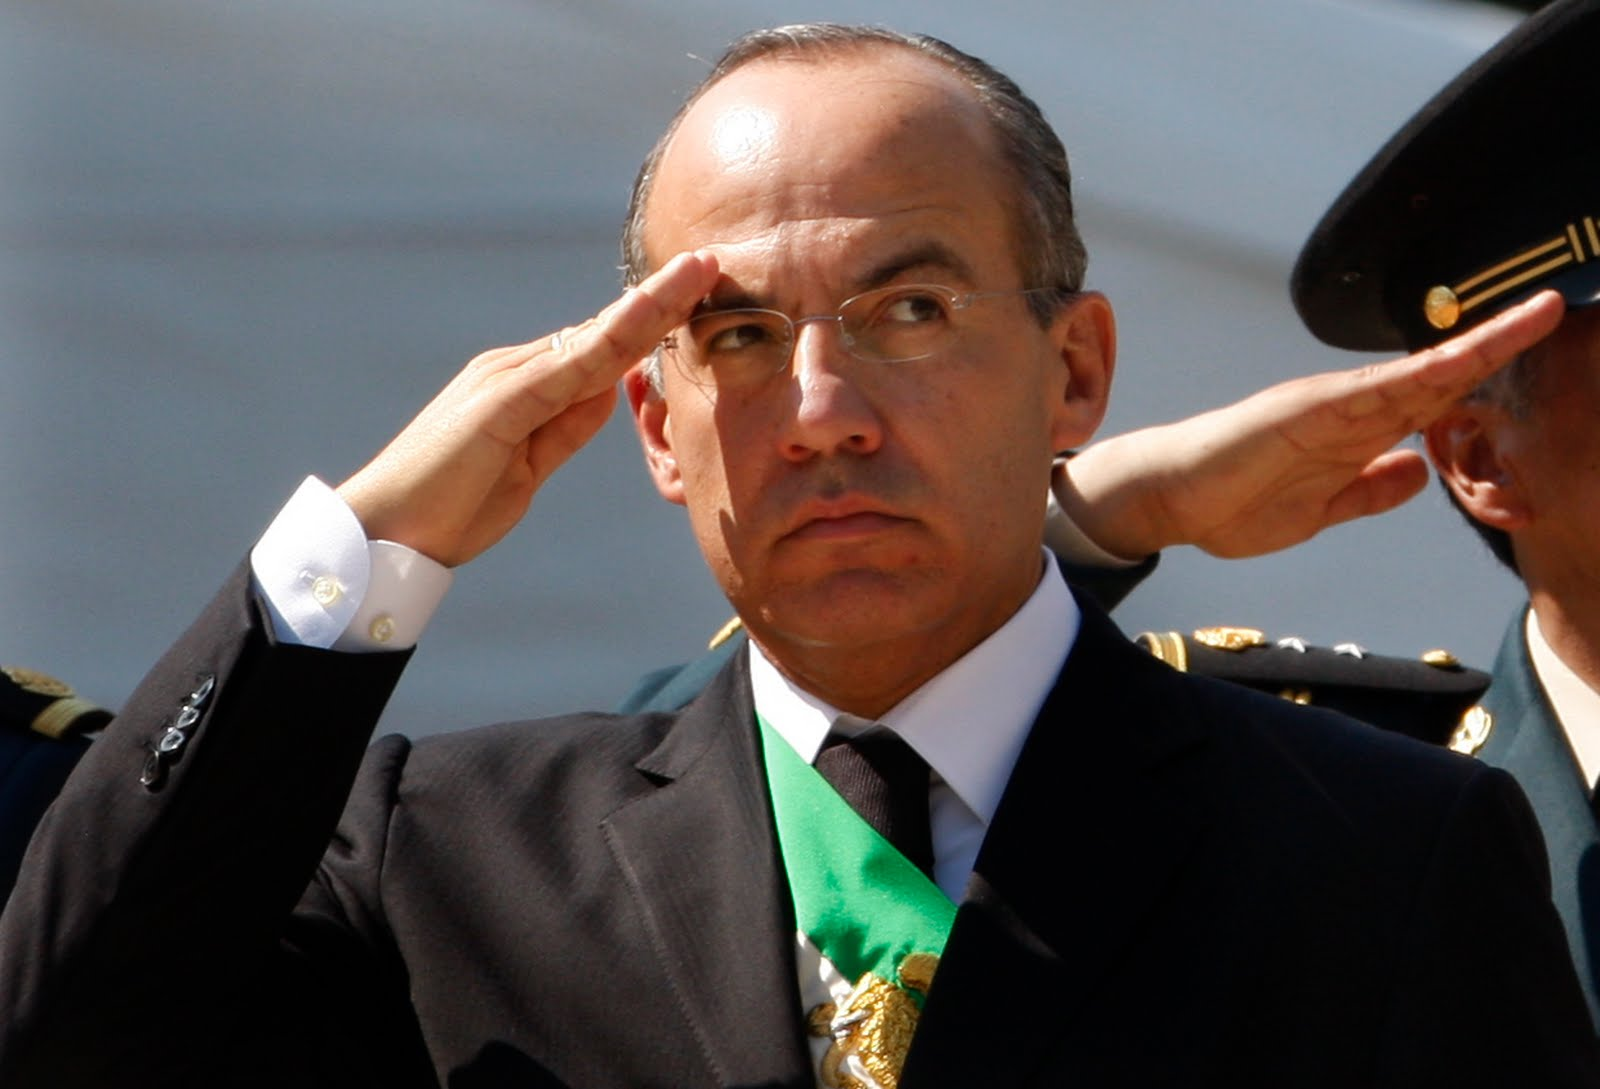 Le Siège ™ANSΨ Triton® Angelcraft Crown Global Security ... Felipe Calderon